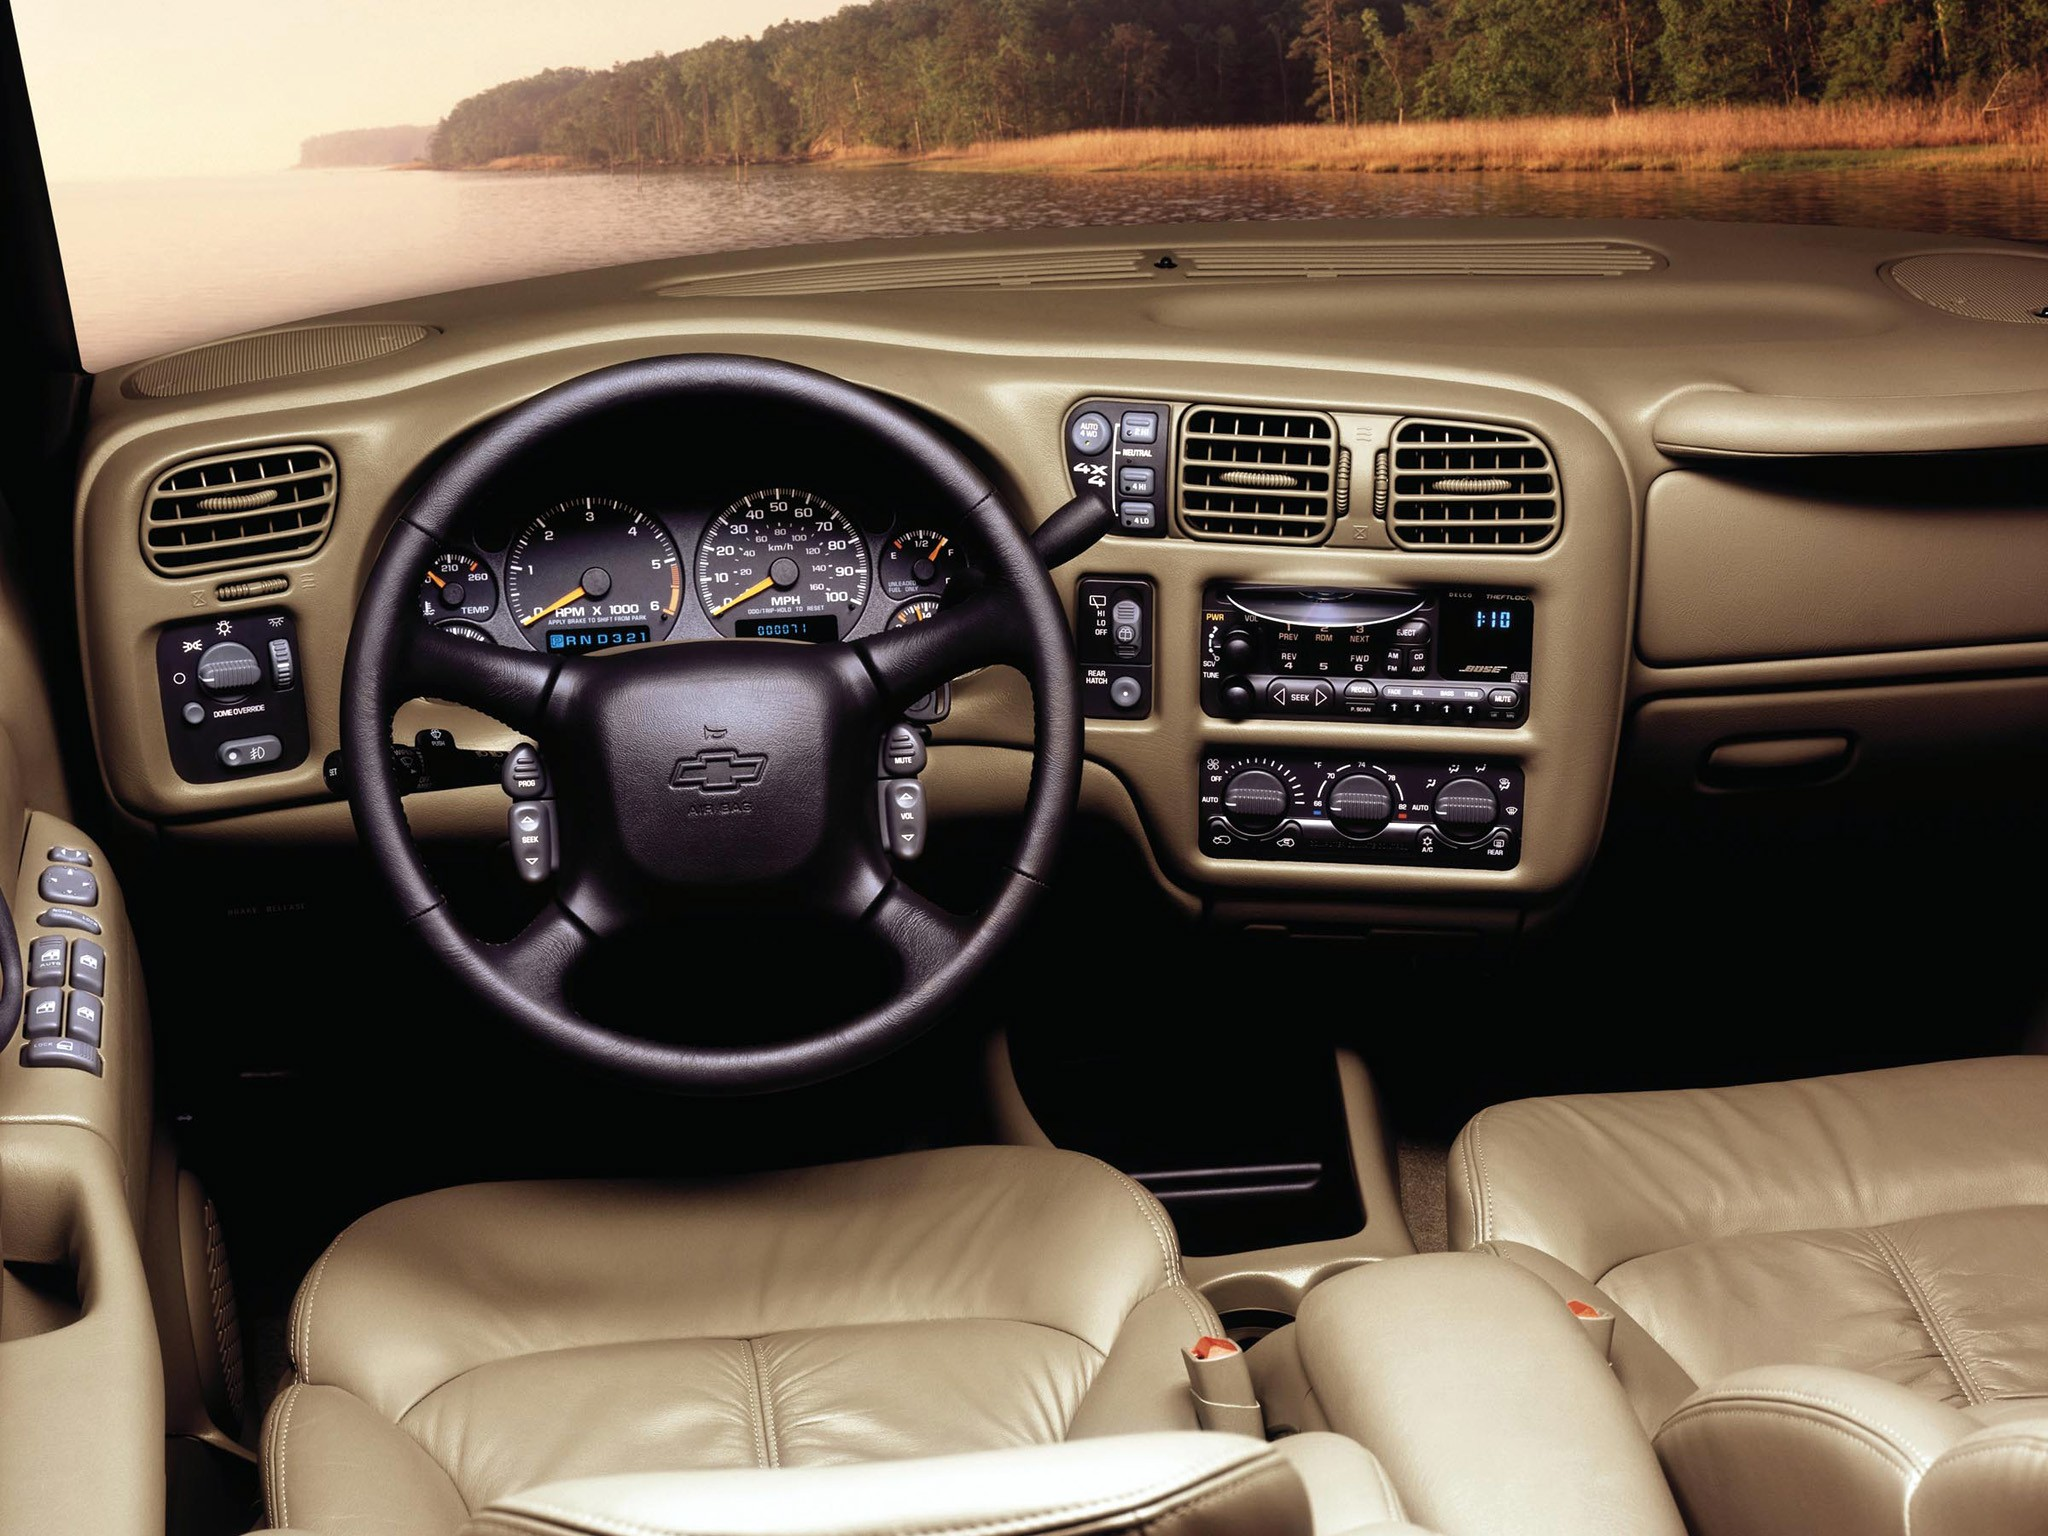 CHEVROLET Blazer 5 doors specs & photos - 1995, 1996, 1997 ...